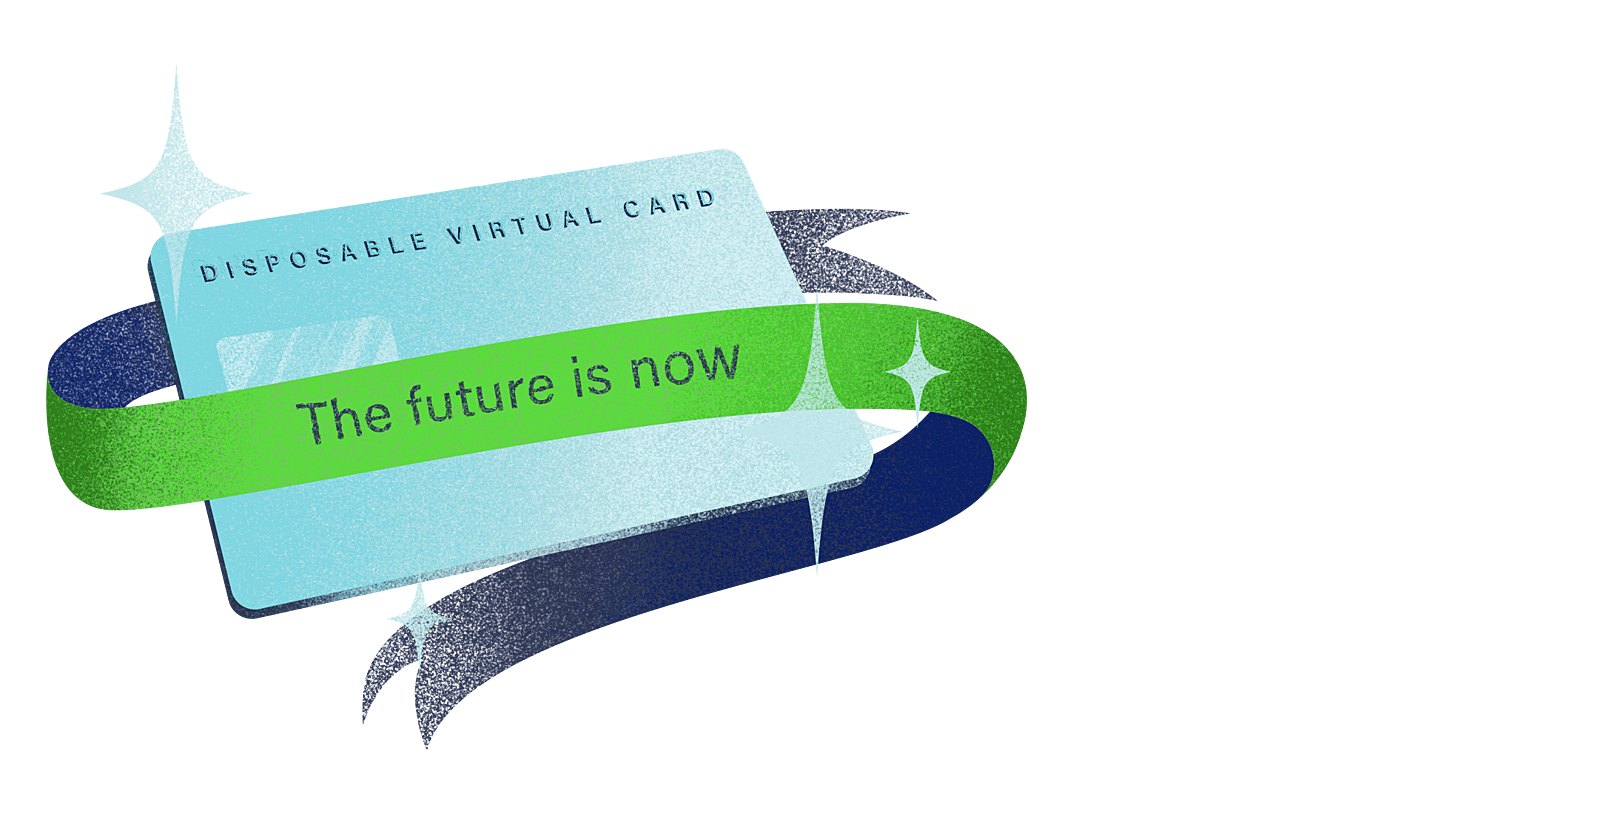 Illustration of a Revolut free card